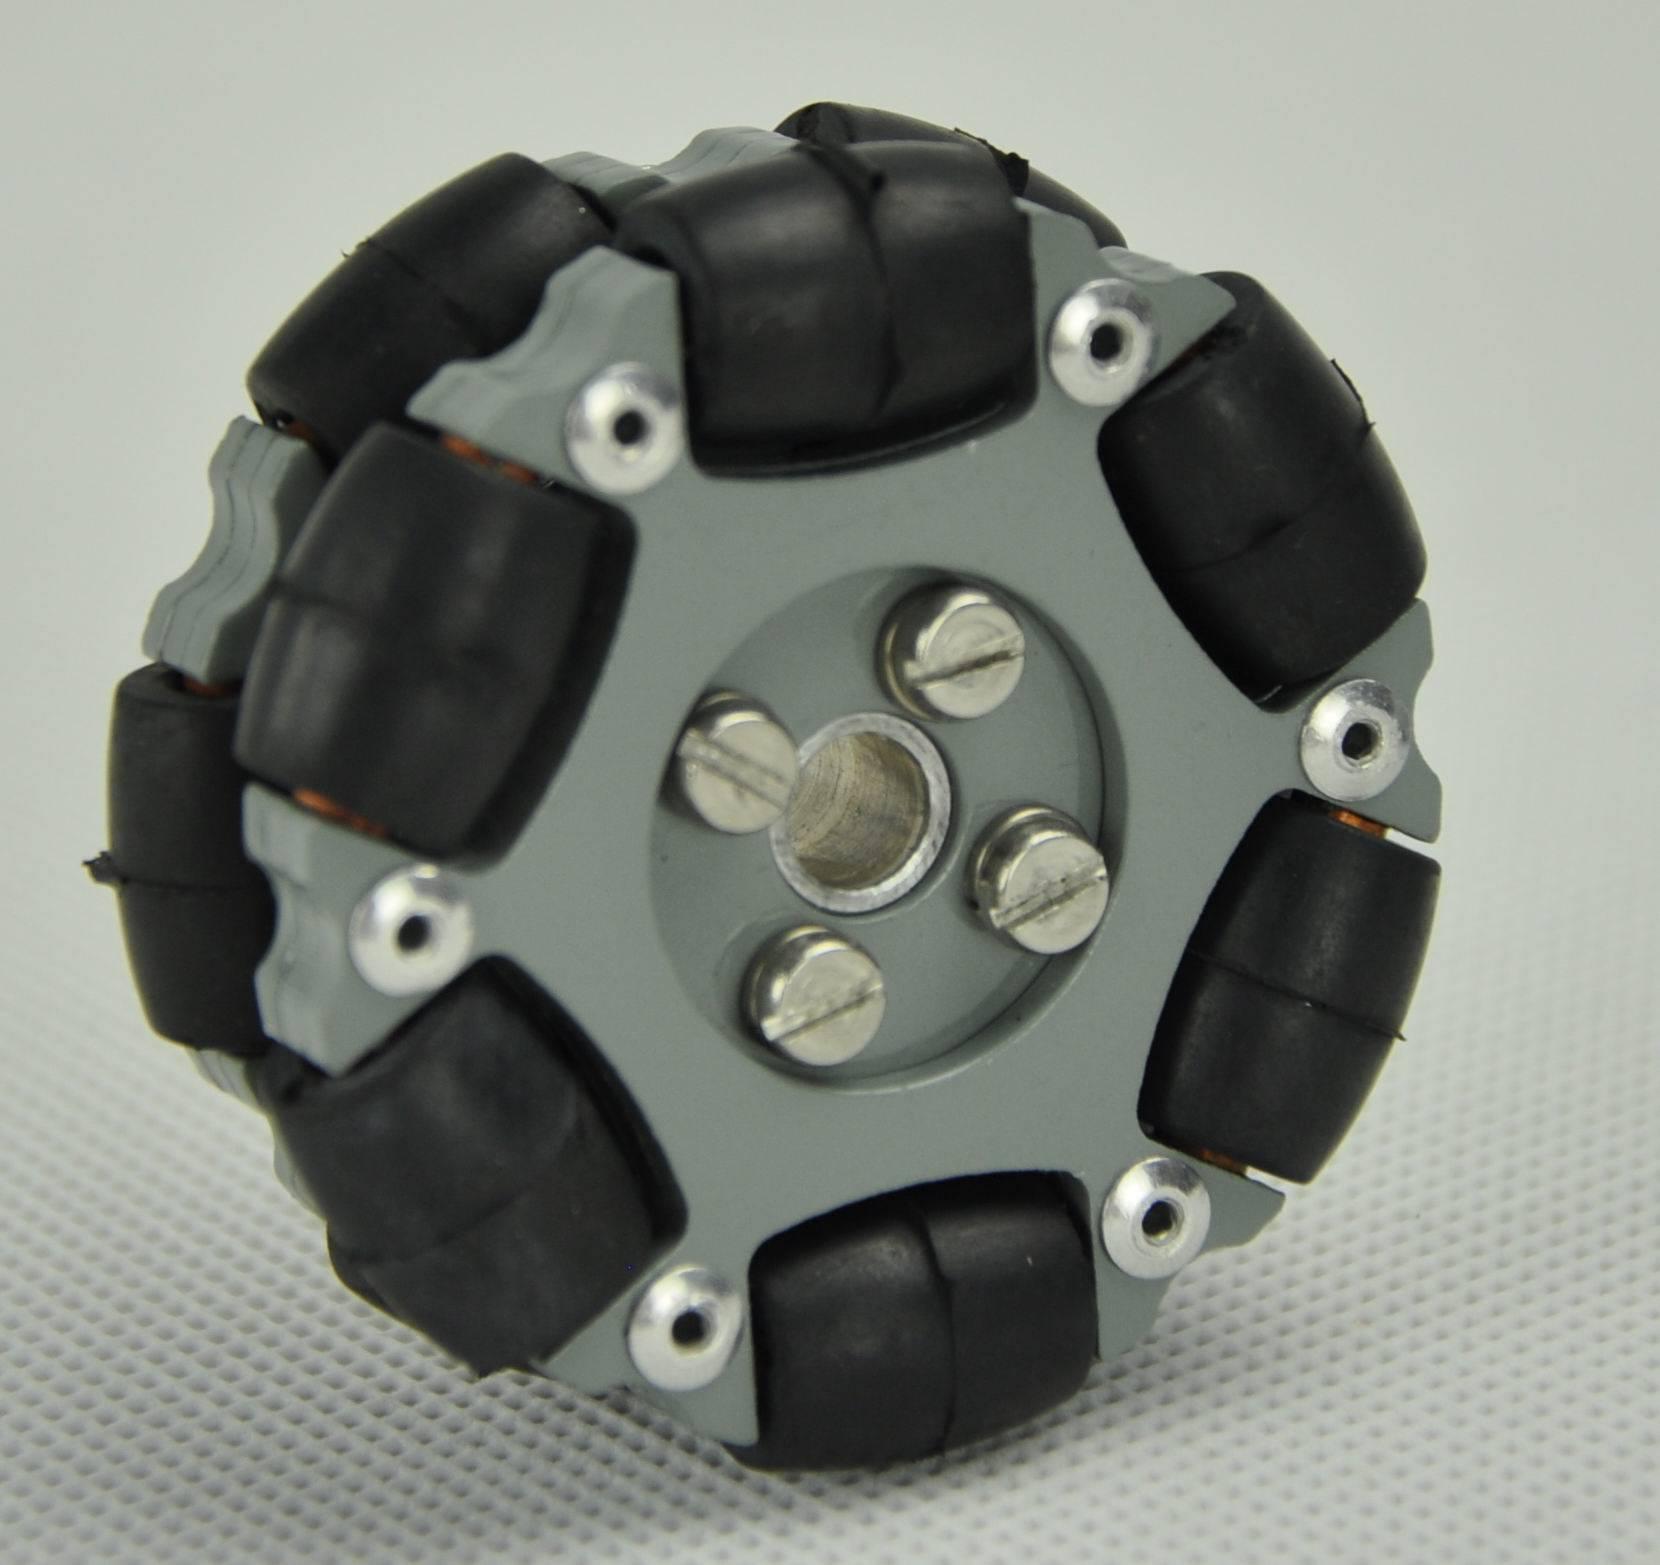 50.8mm double aluminum hub omni directional wheels for ROBOCON, FTC